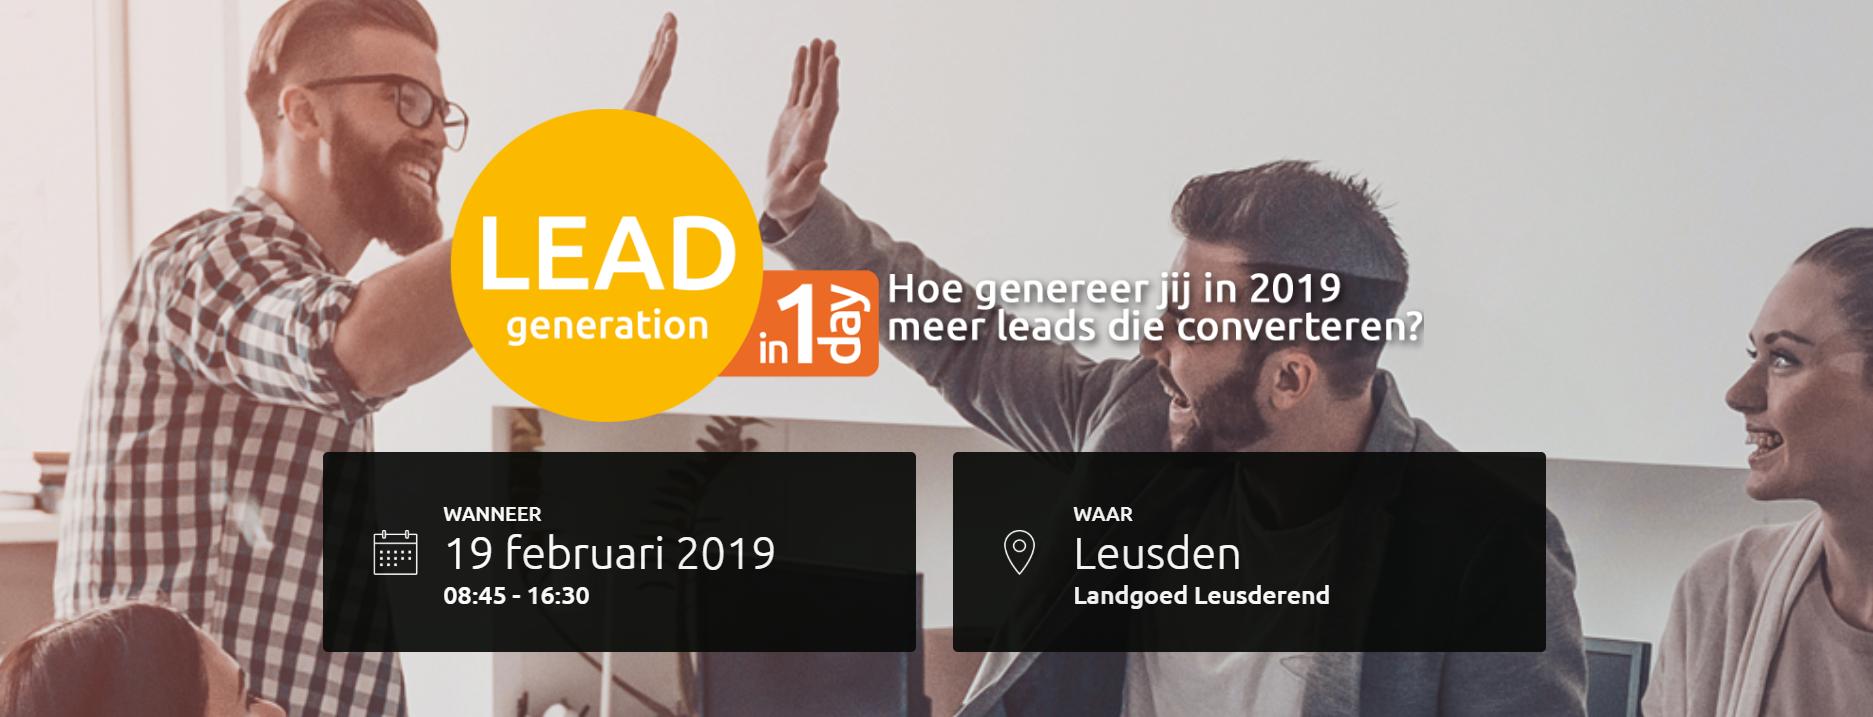 Leadgeneration in 1 Day 2019